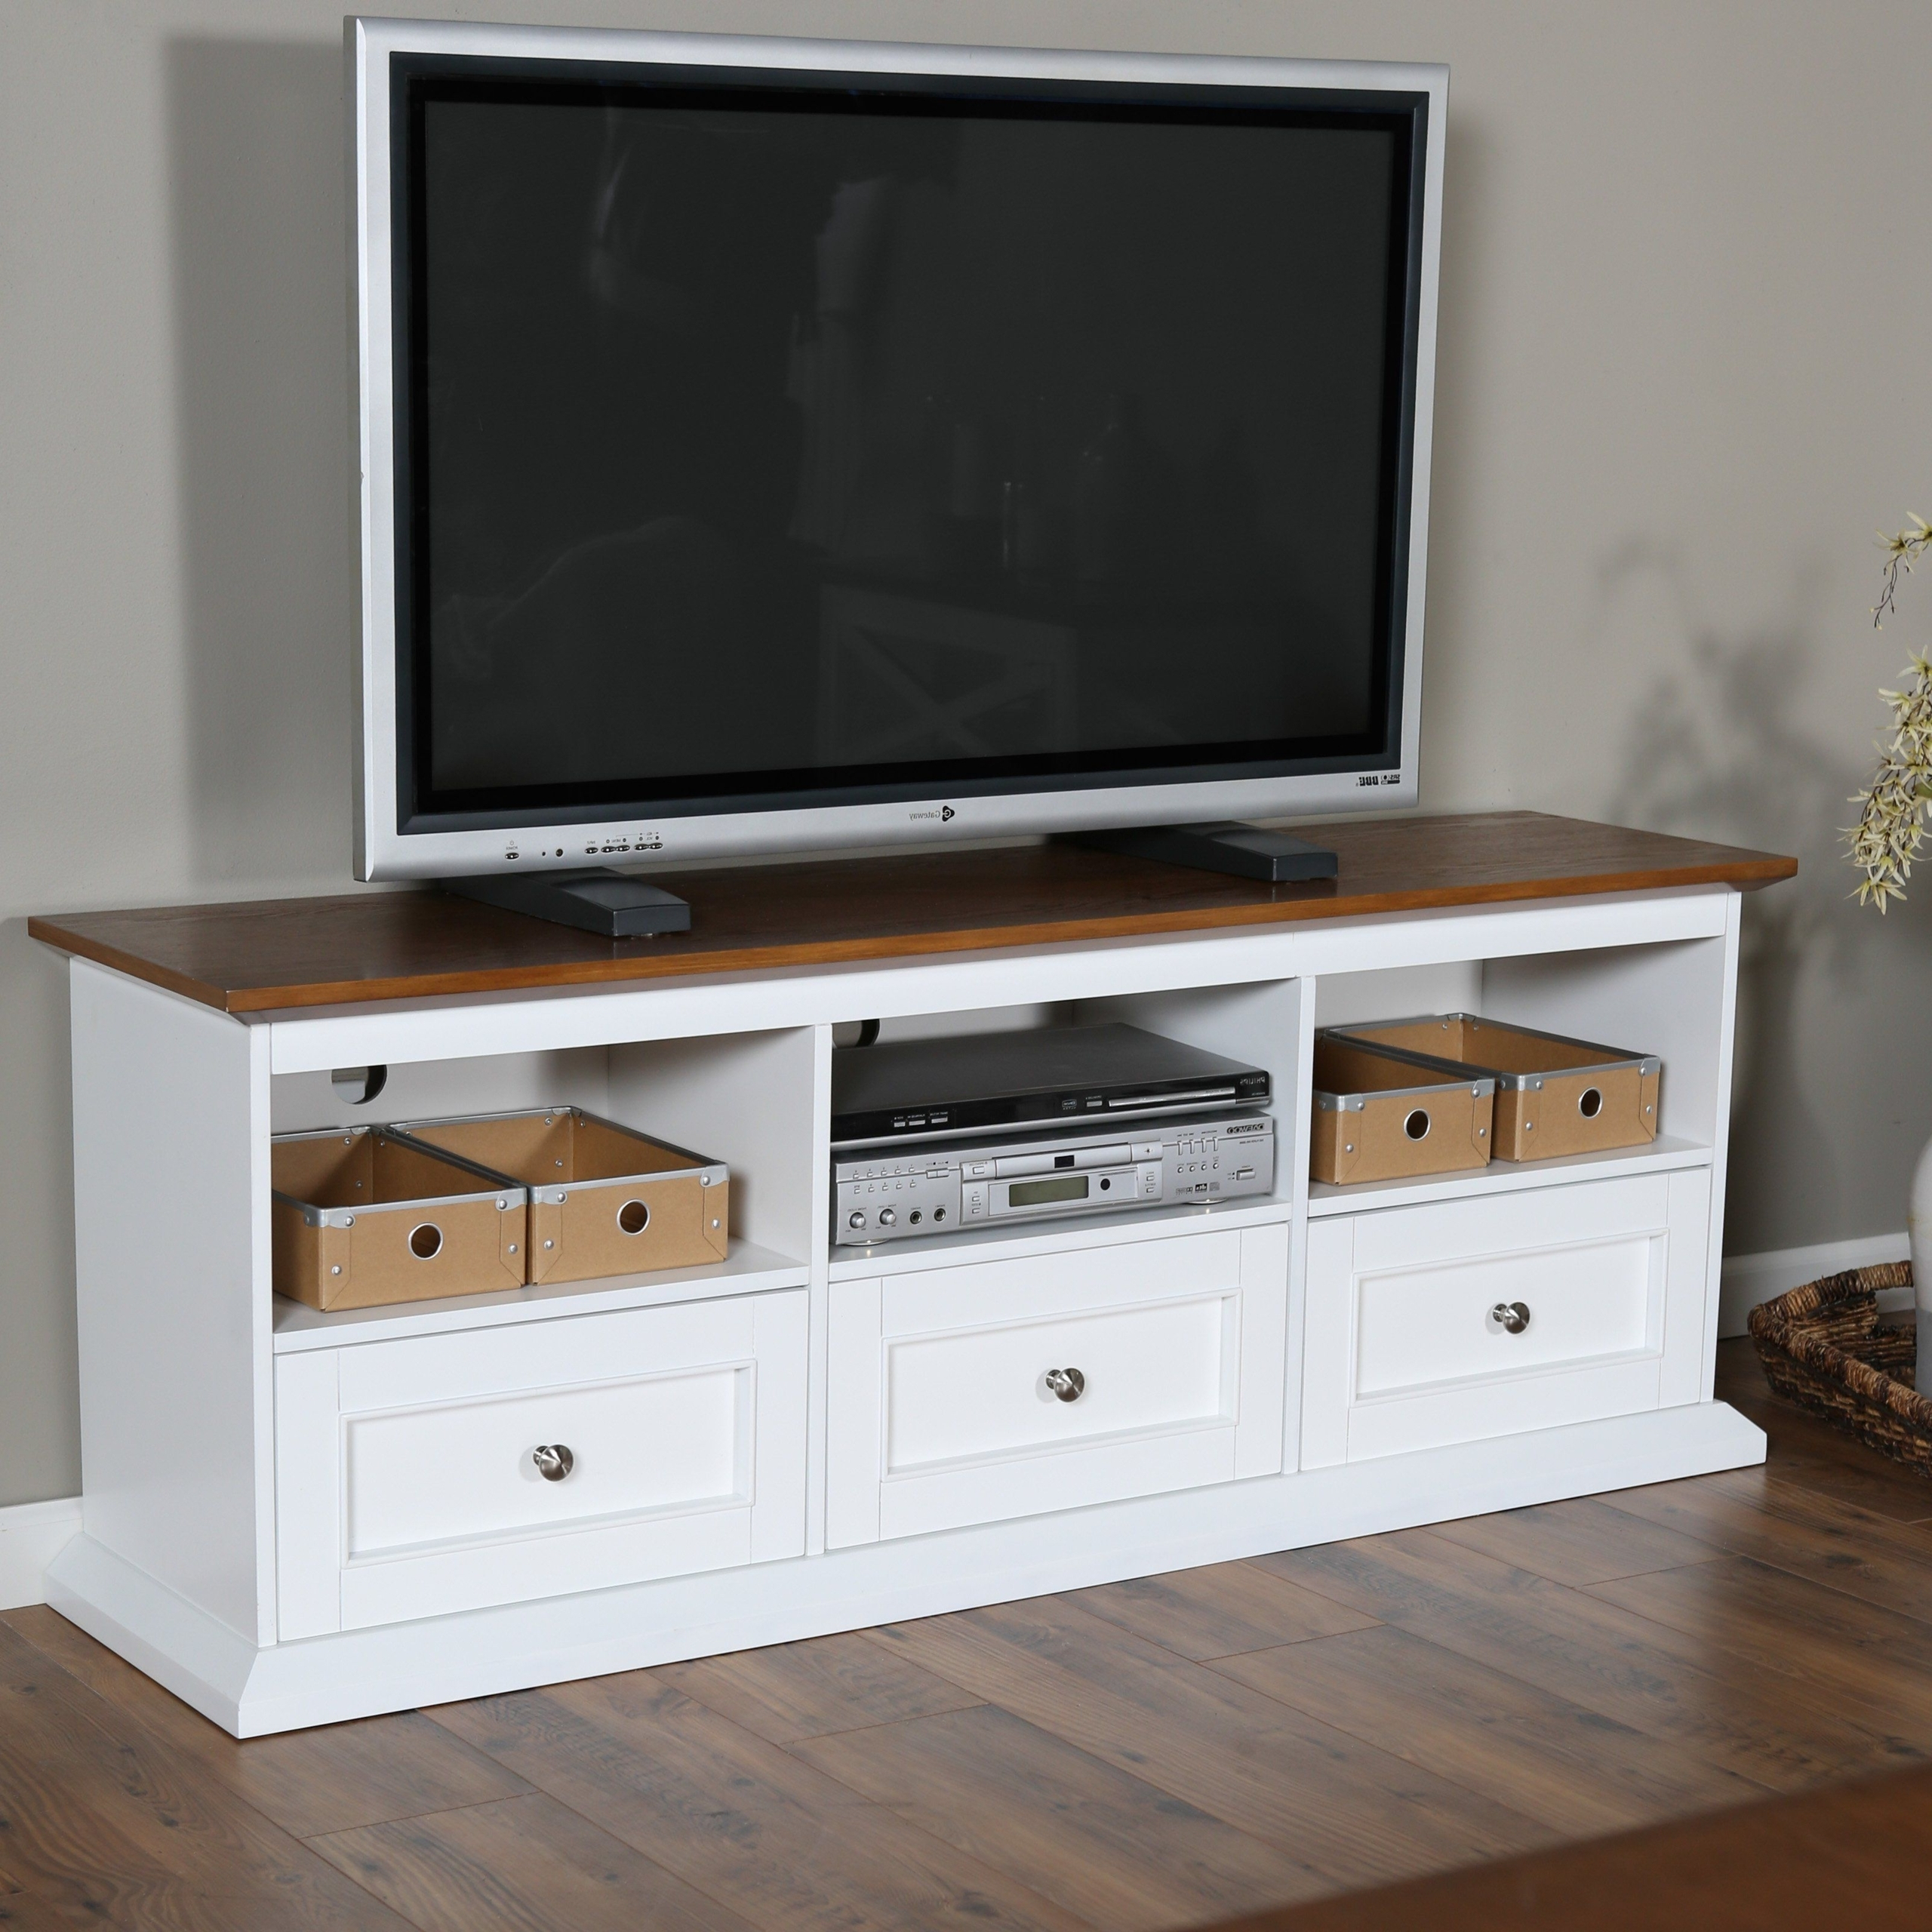 White Oak Tv Stand – Ideas On Foter Regarding Well Liked Modern 2 Glass Door Corner Tv Stands (View 1 of 10)